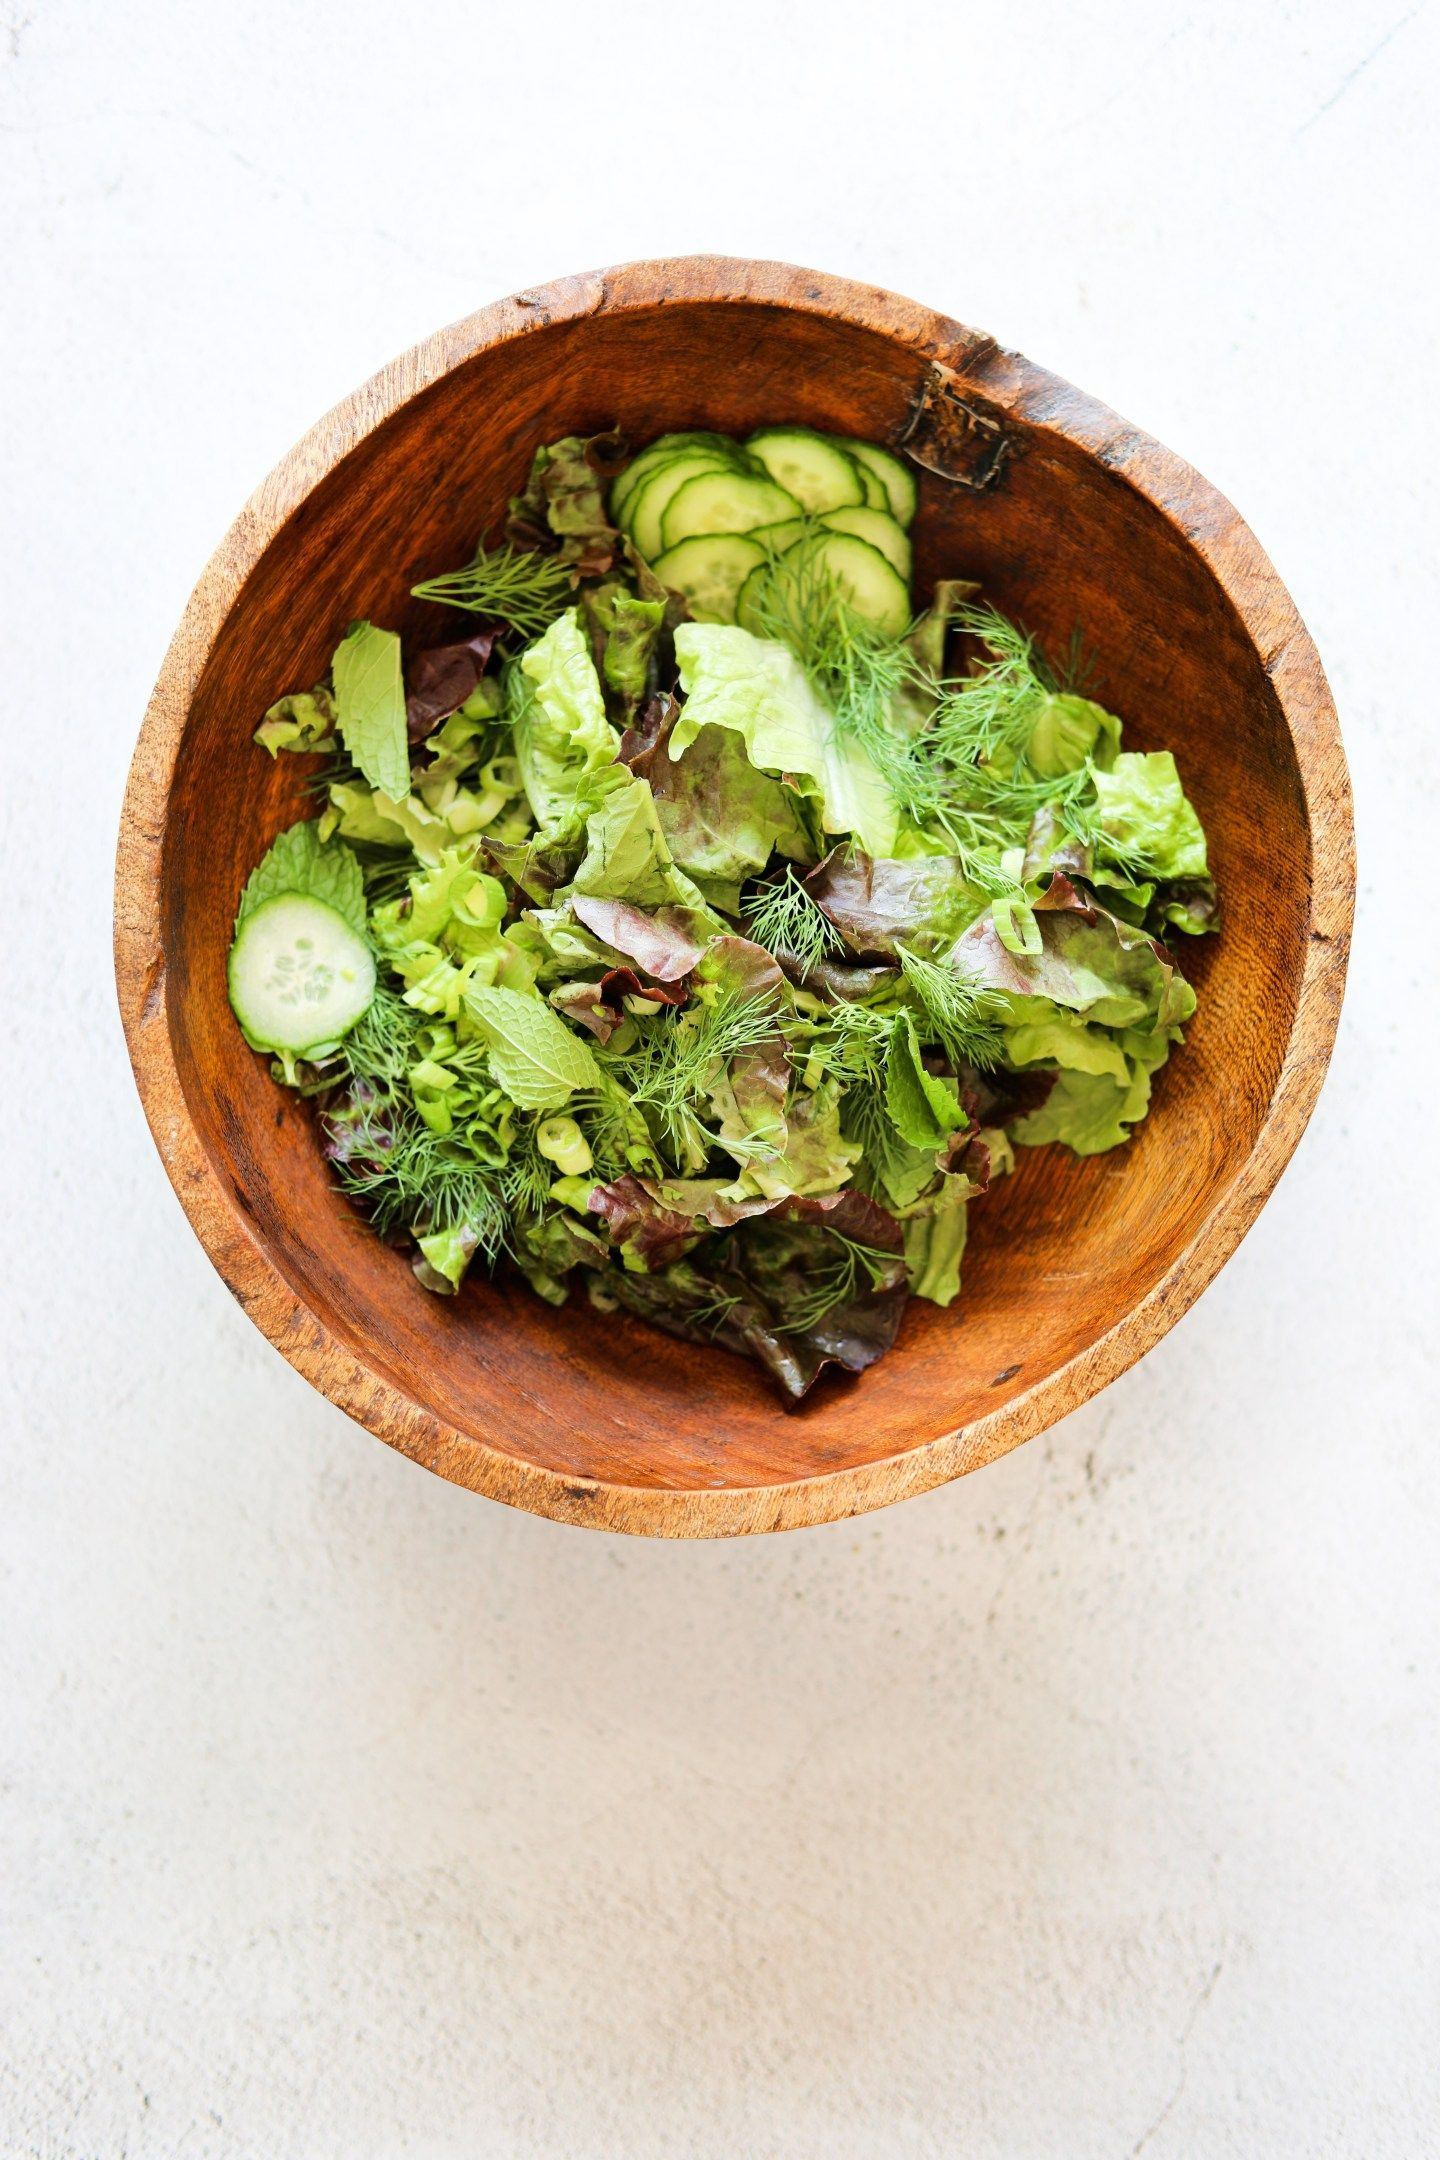 Green Goddess Salad With Basil Tahini Dressing Craving California Recipe Tahini Dressing Yummy Lunches Eat Salad [ 2160 x 1440 Pixel ]